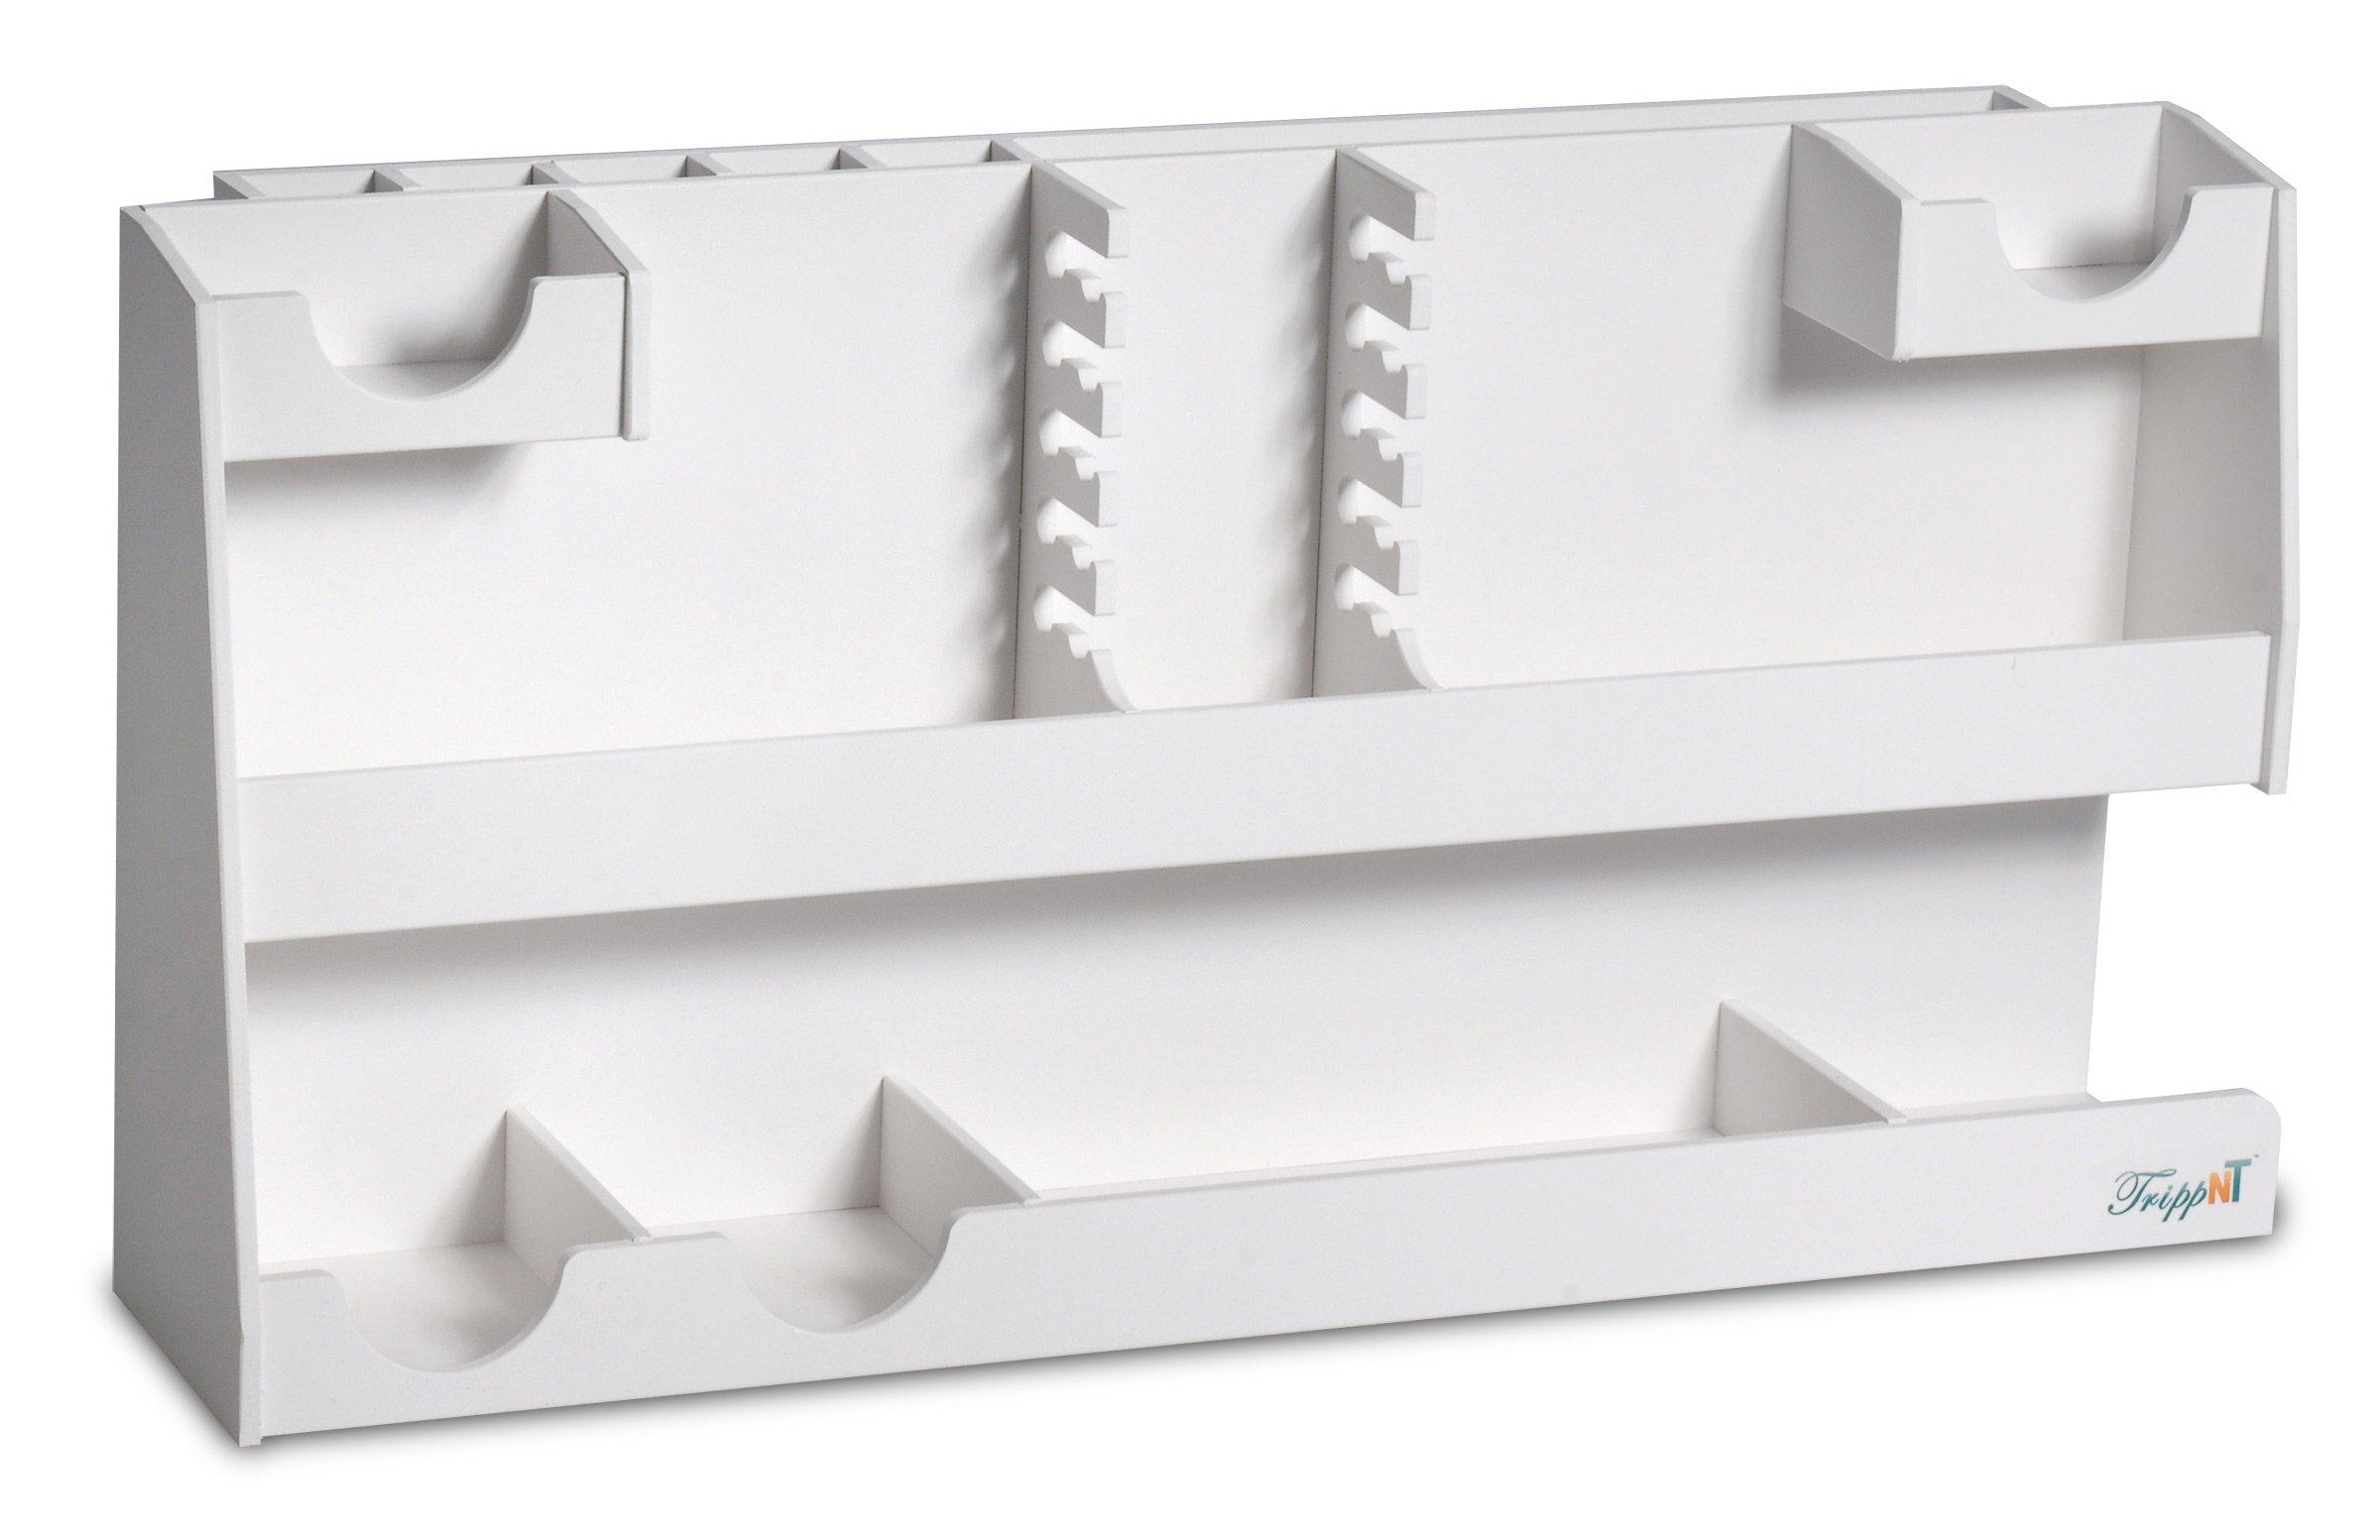 "TrippNT 50664 PVC Plastic White Personal Bench Top HPLC Supplies Organizer, 24"" Width x 12"" Height x 6"" Depth"